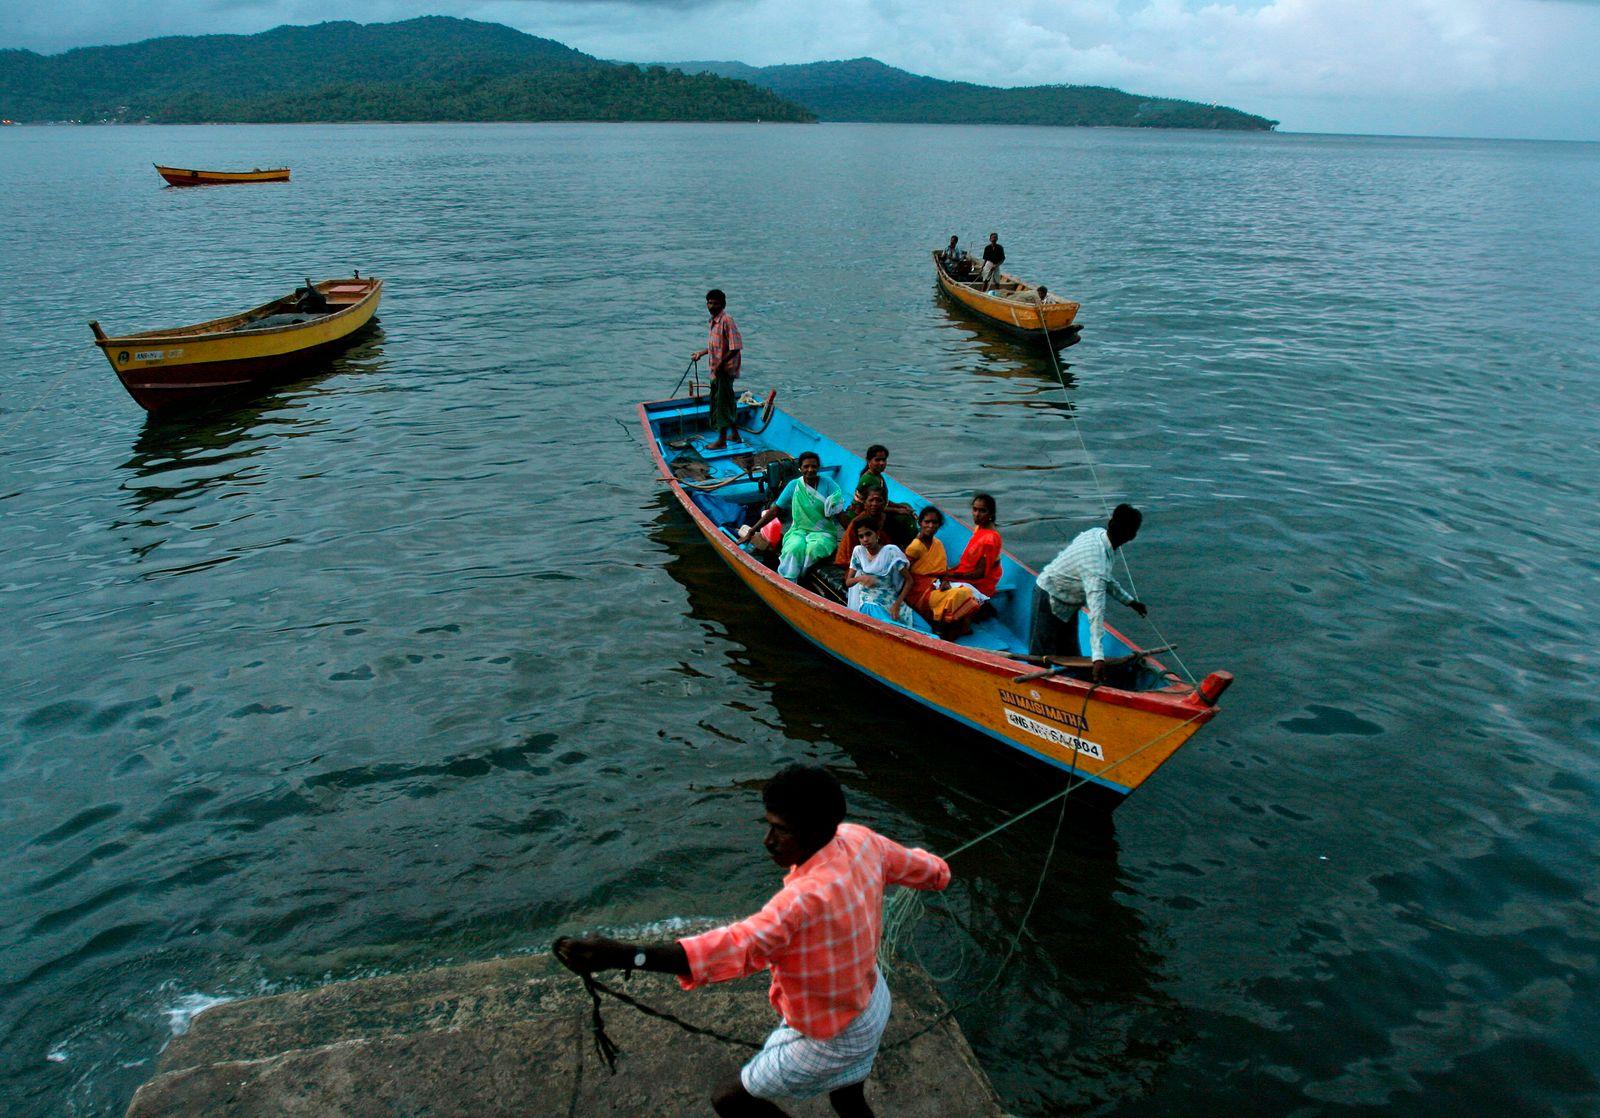 Virus Outbreak Andaman and Nicobar